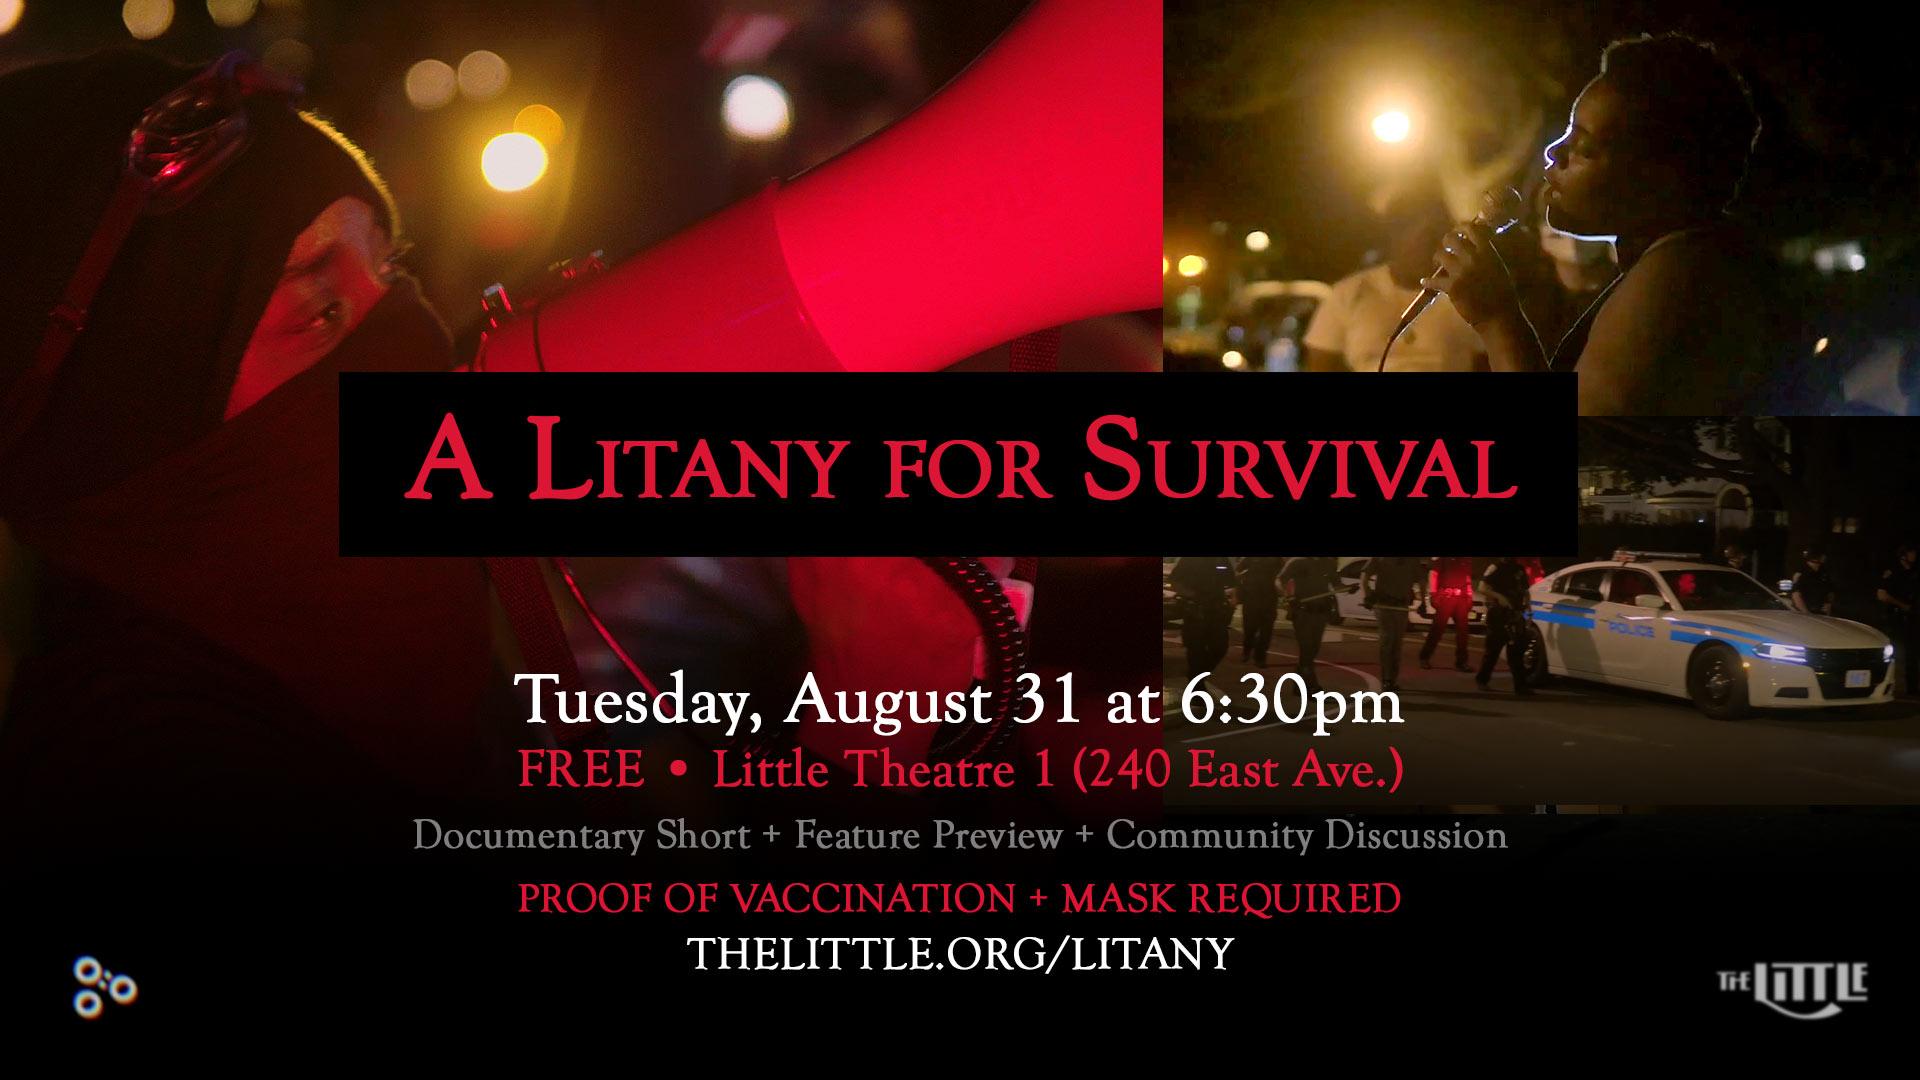 A Litany for Survival - New Slide